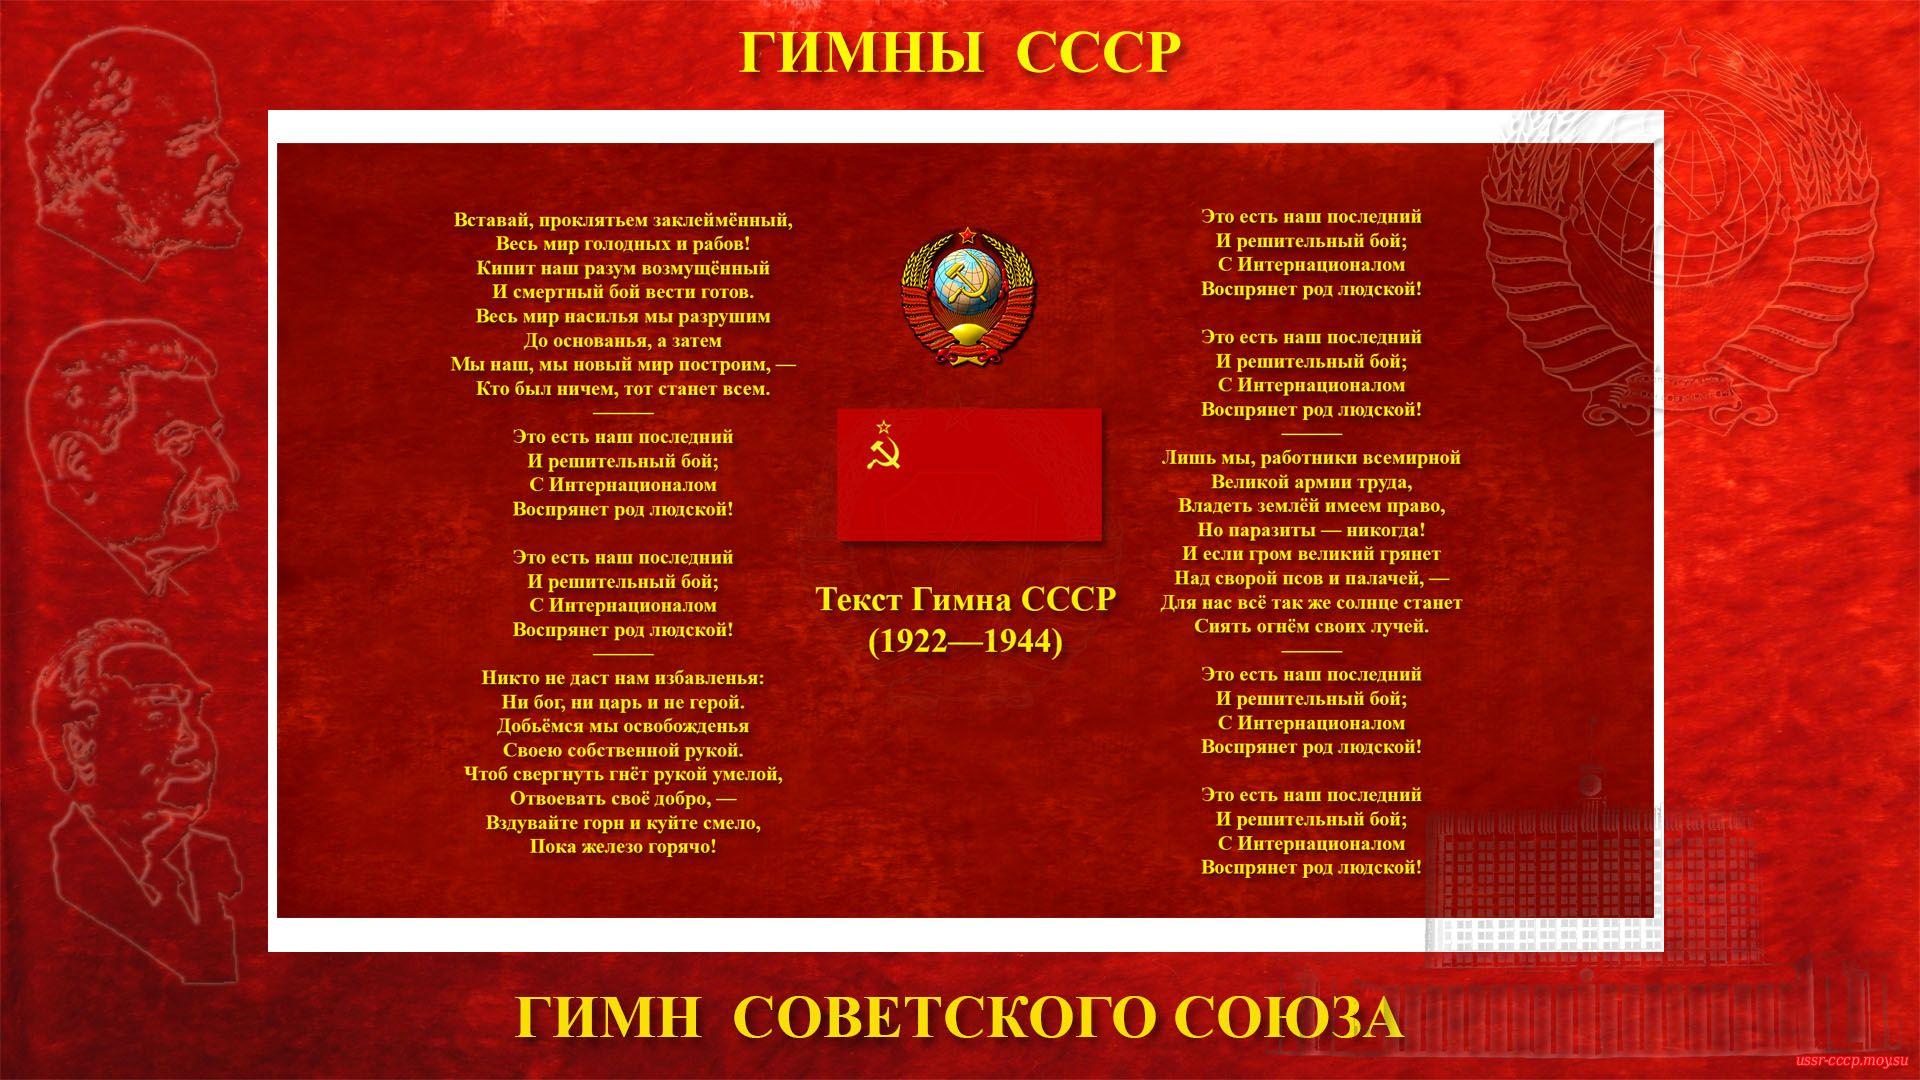 Текст Гимна СССР (1922—1944)